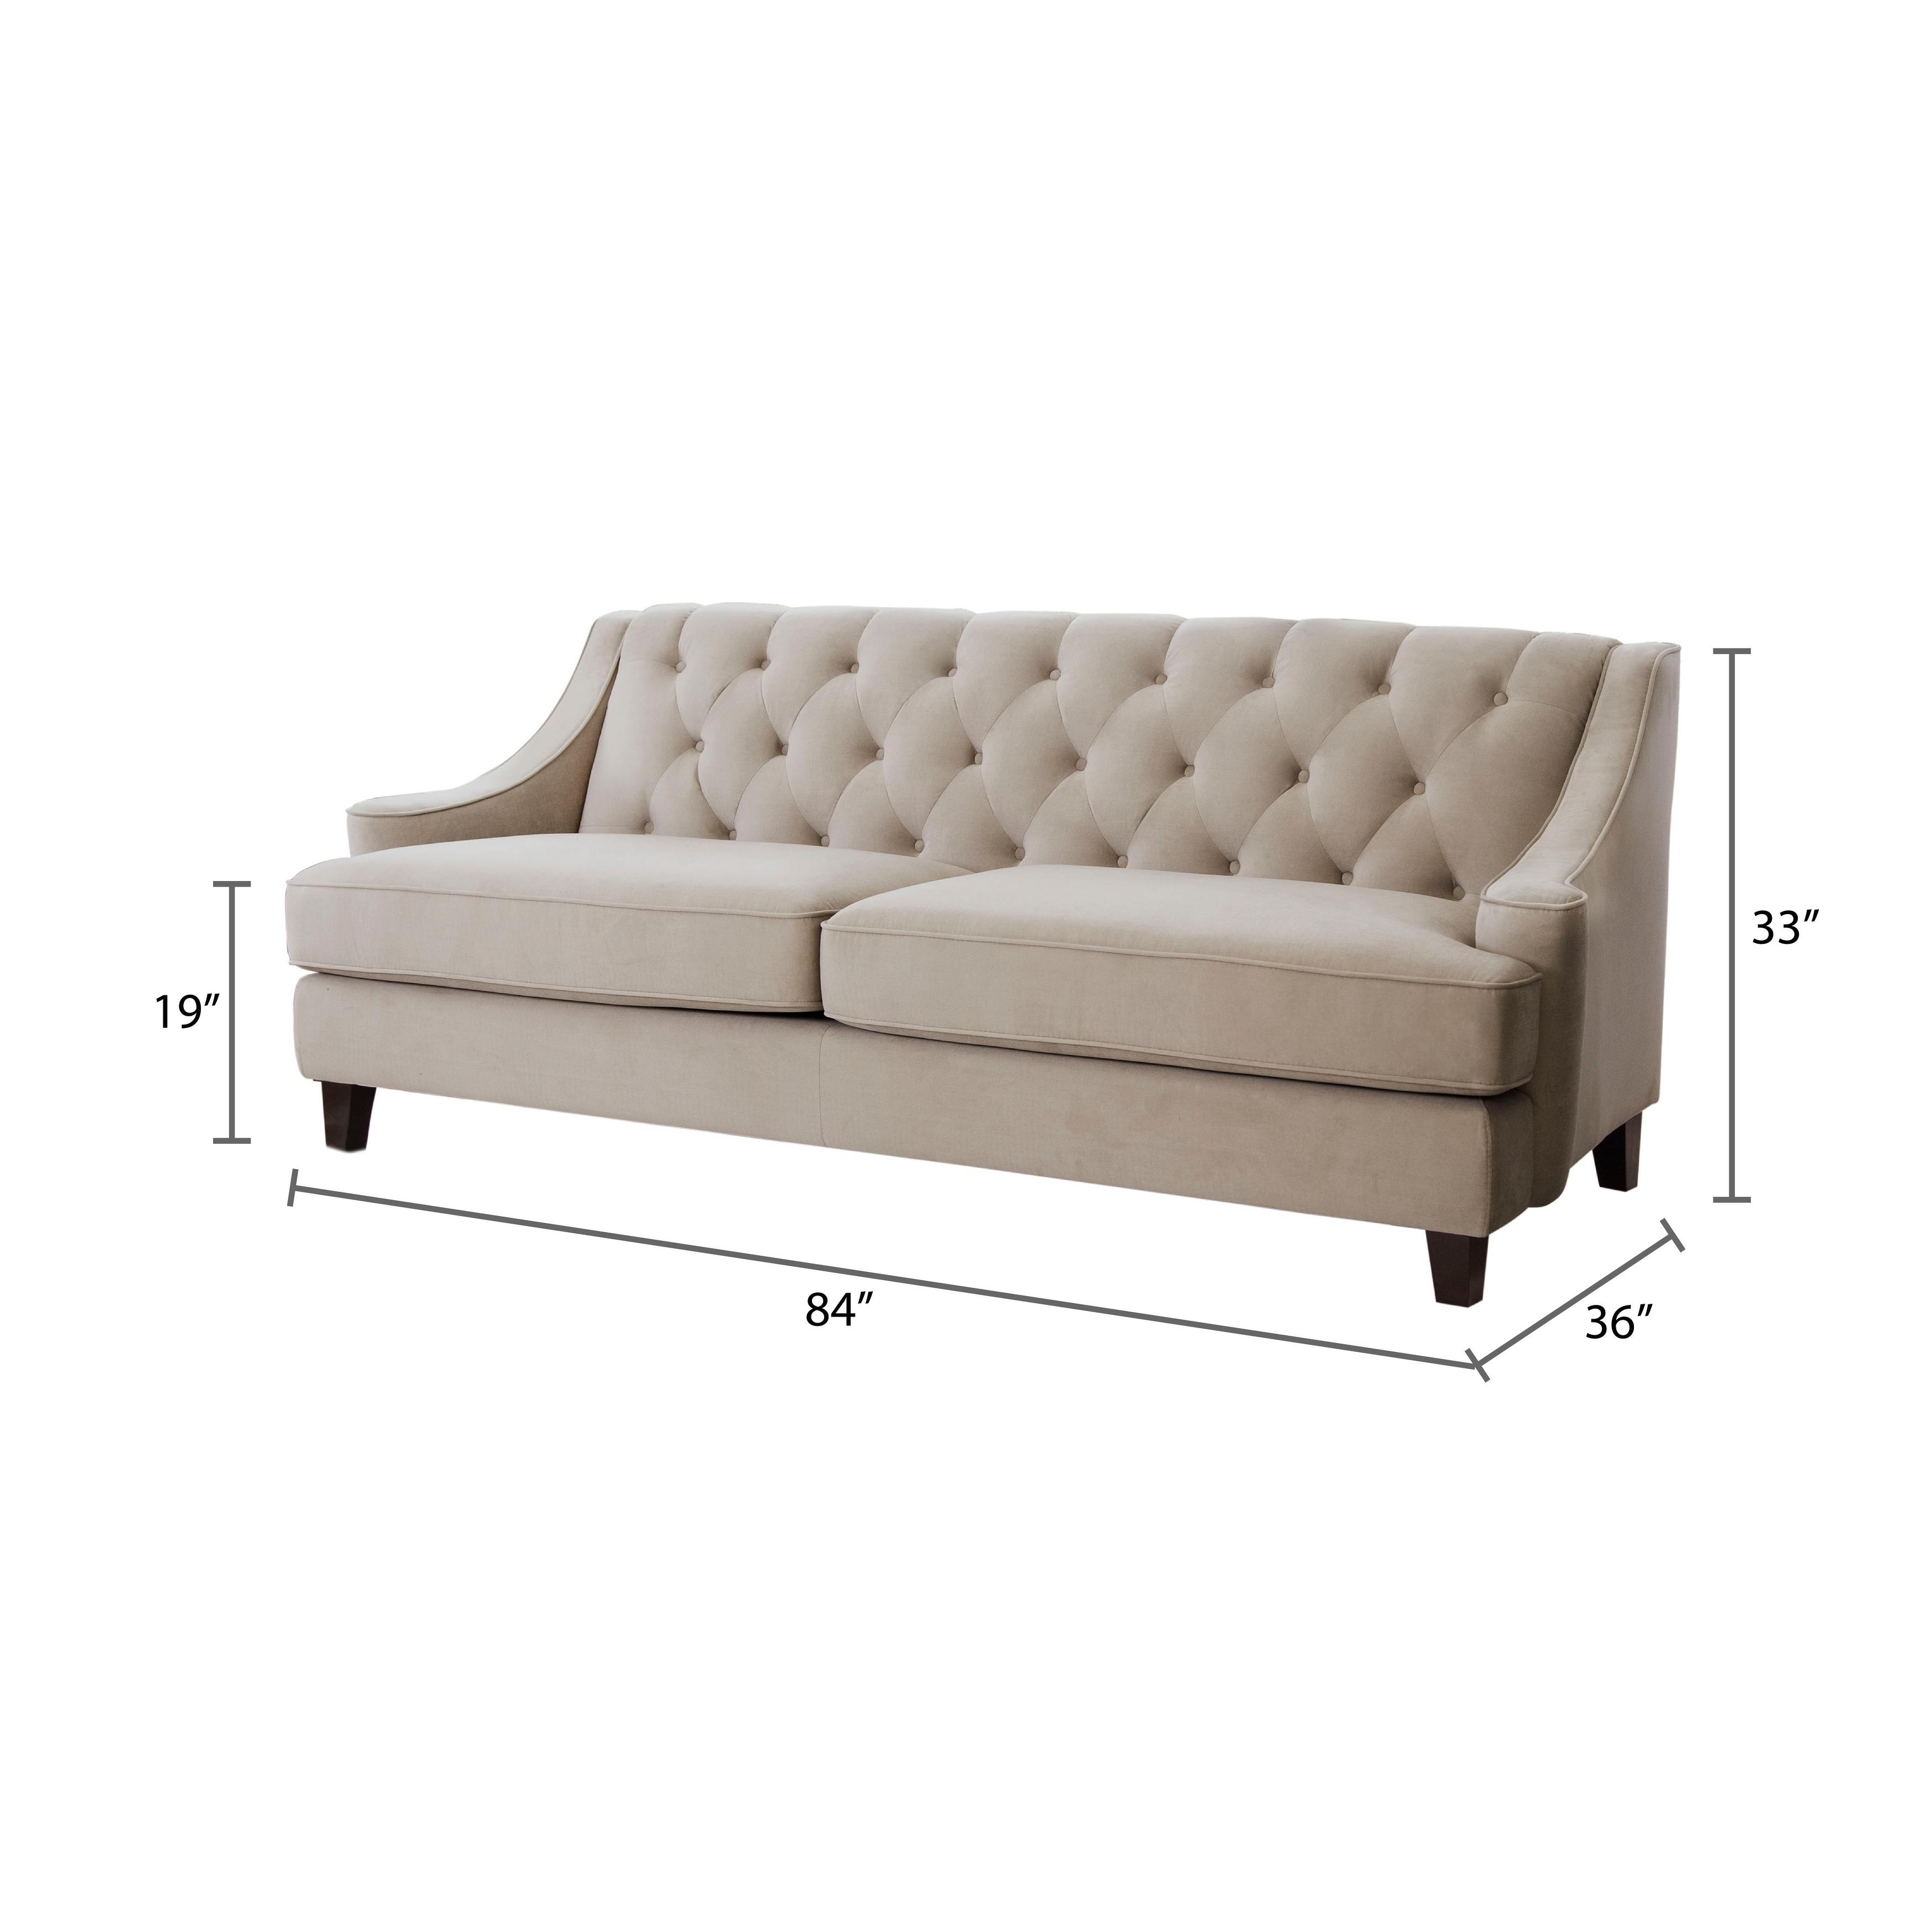 Taupe Velvet Sofa: Tufted Back Sofa Meaning